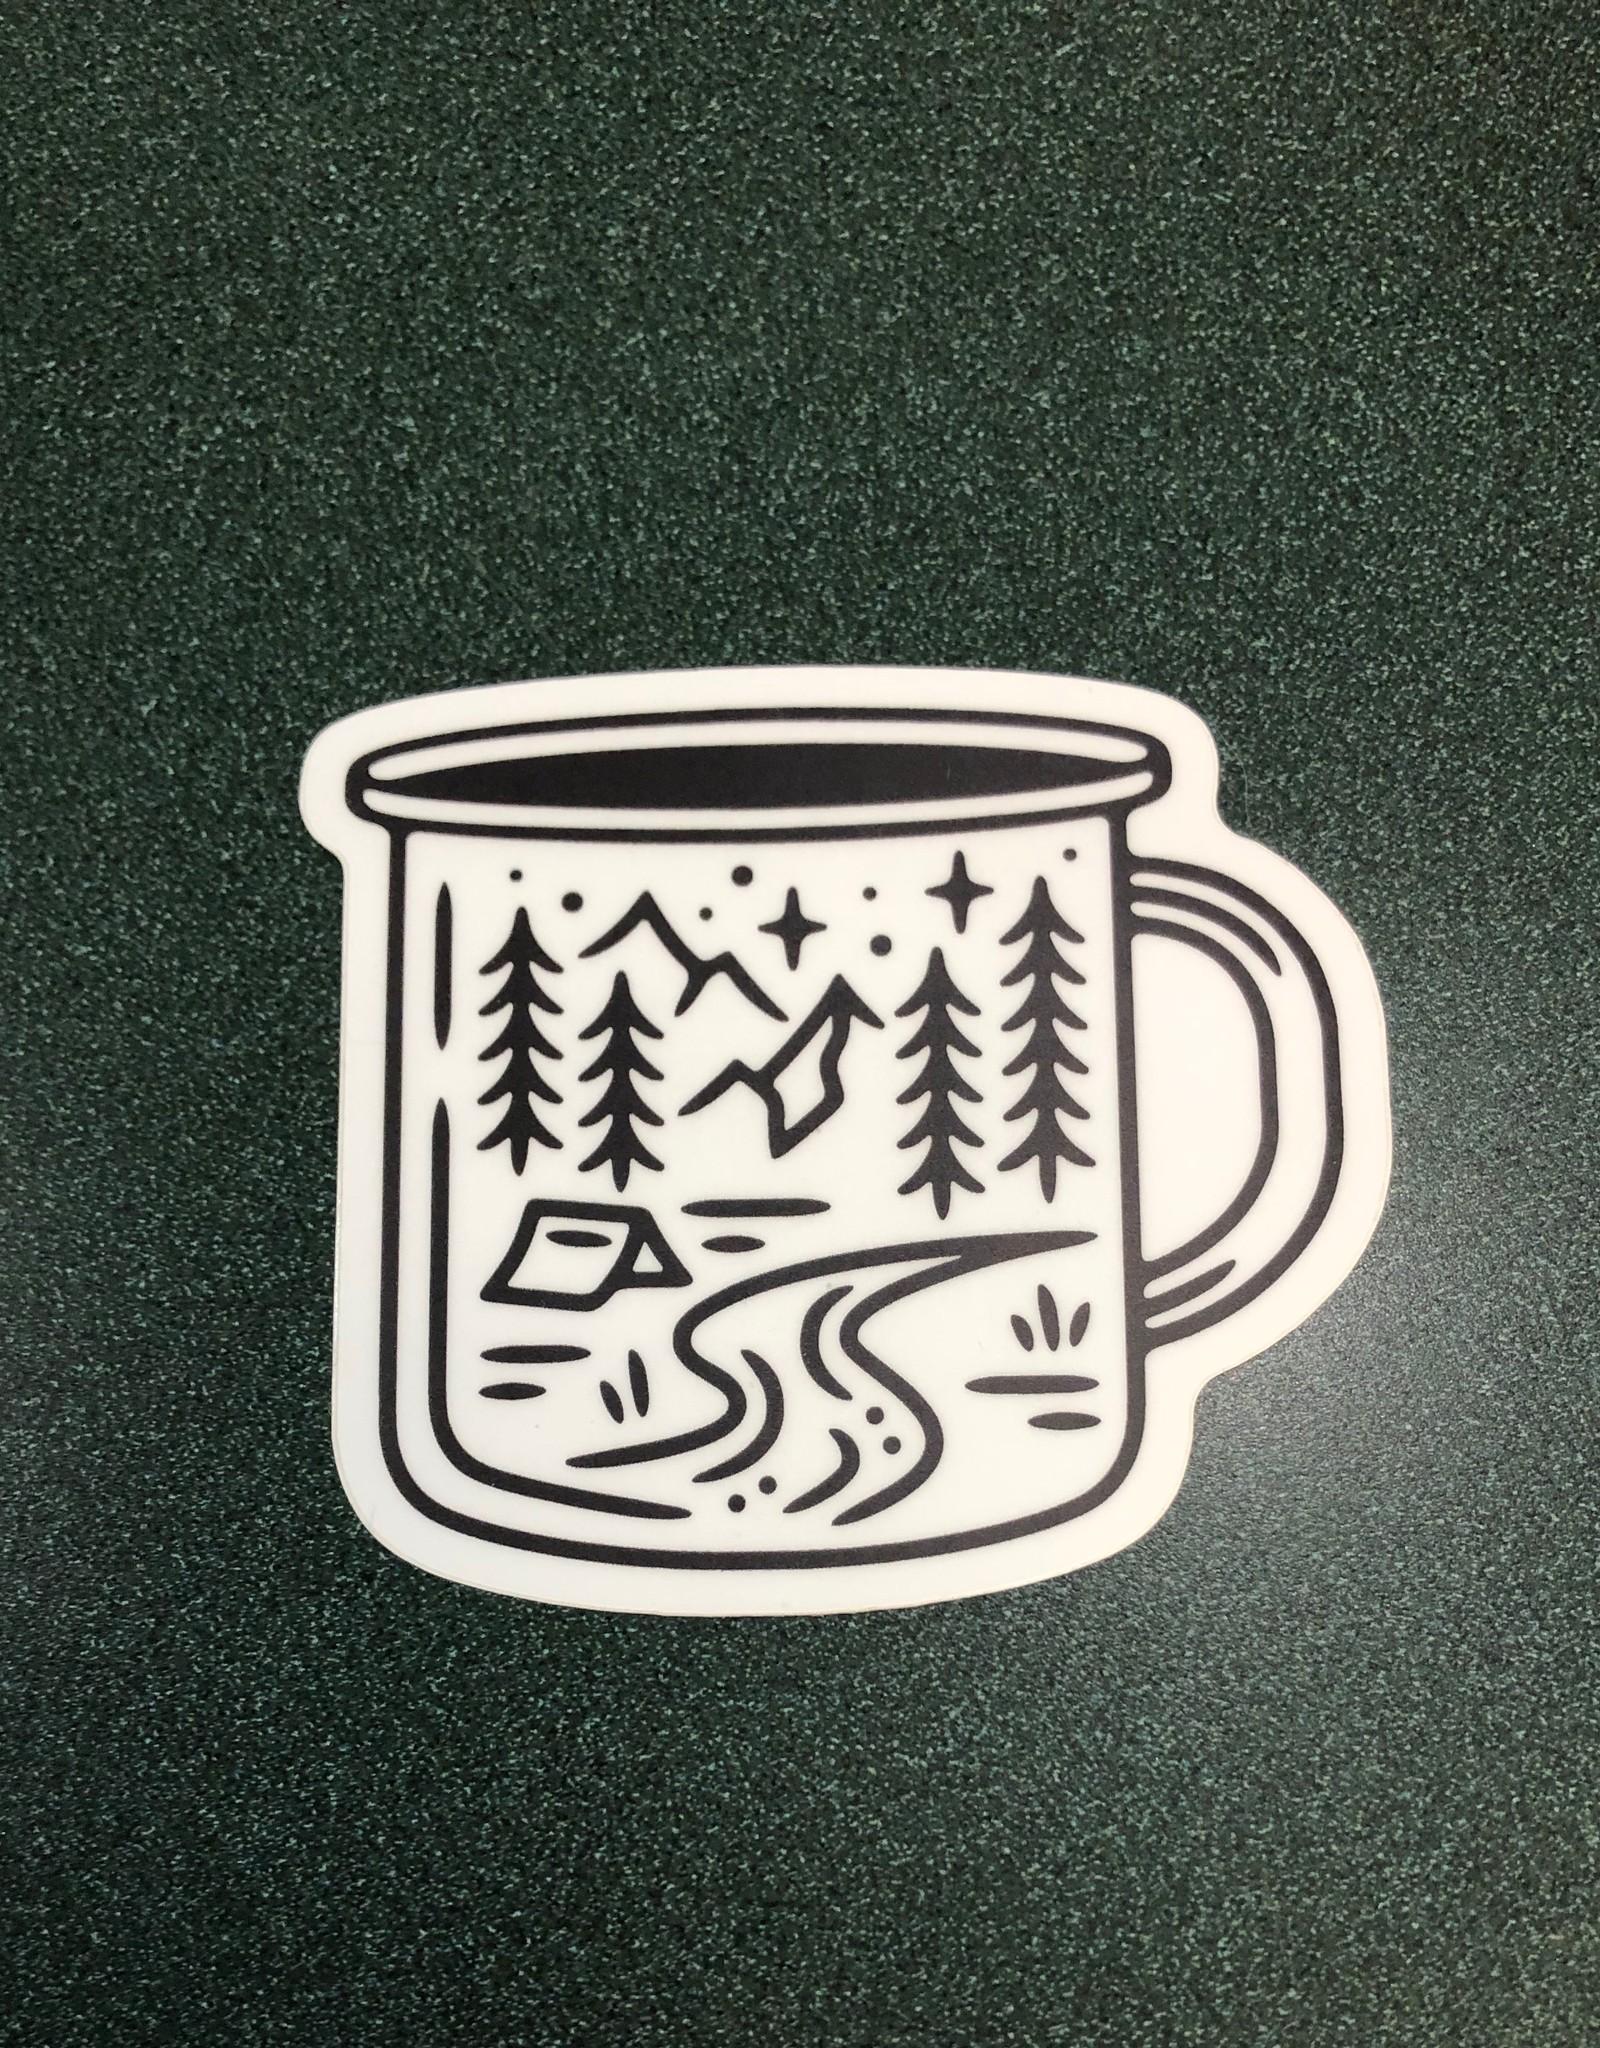 Stickers NW CAMPING MUG SCENE